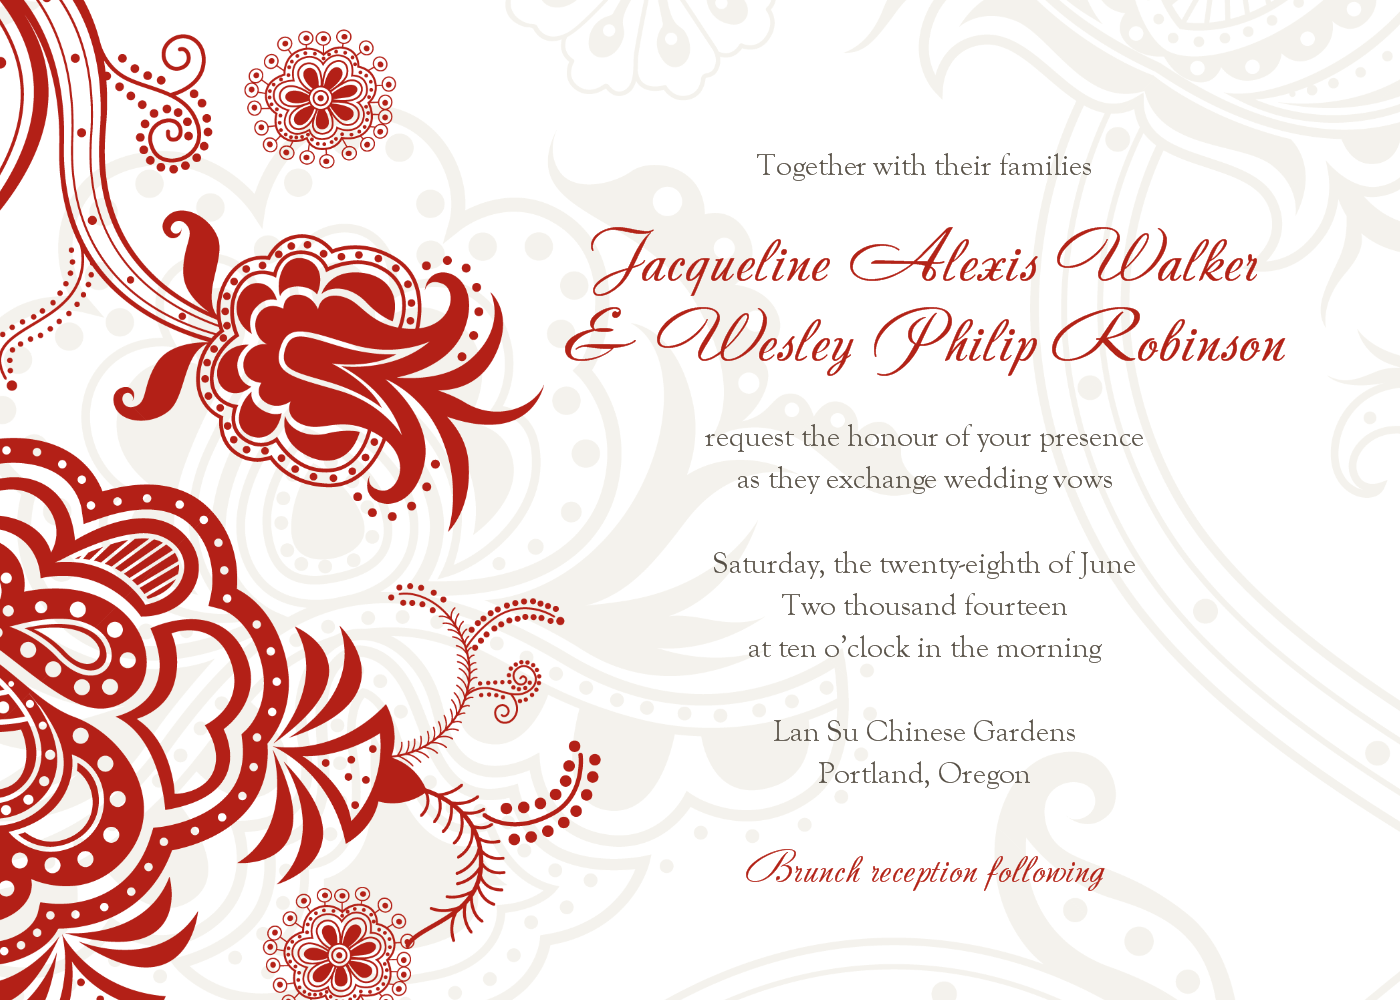 Steampunk Wedding Invitations - The Best Wedding Invitation 2017